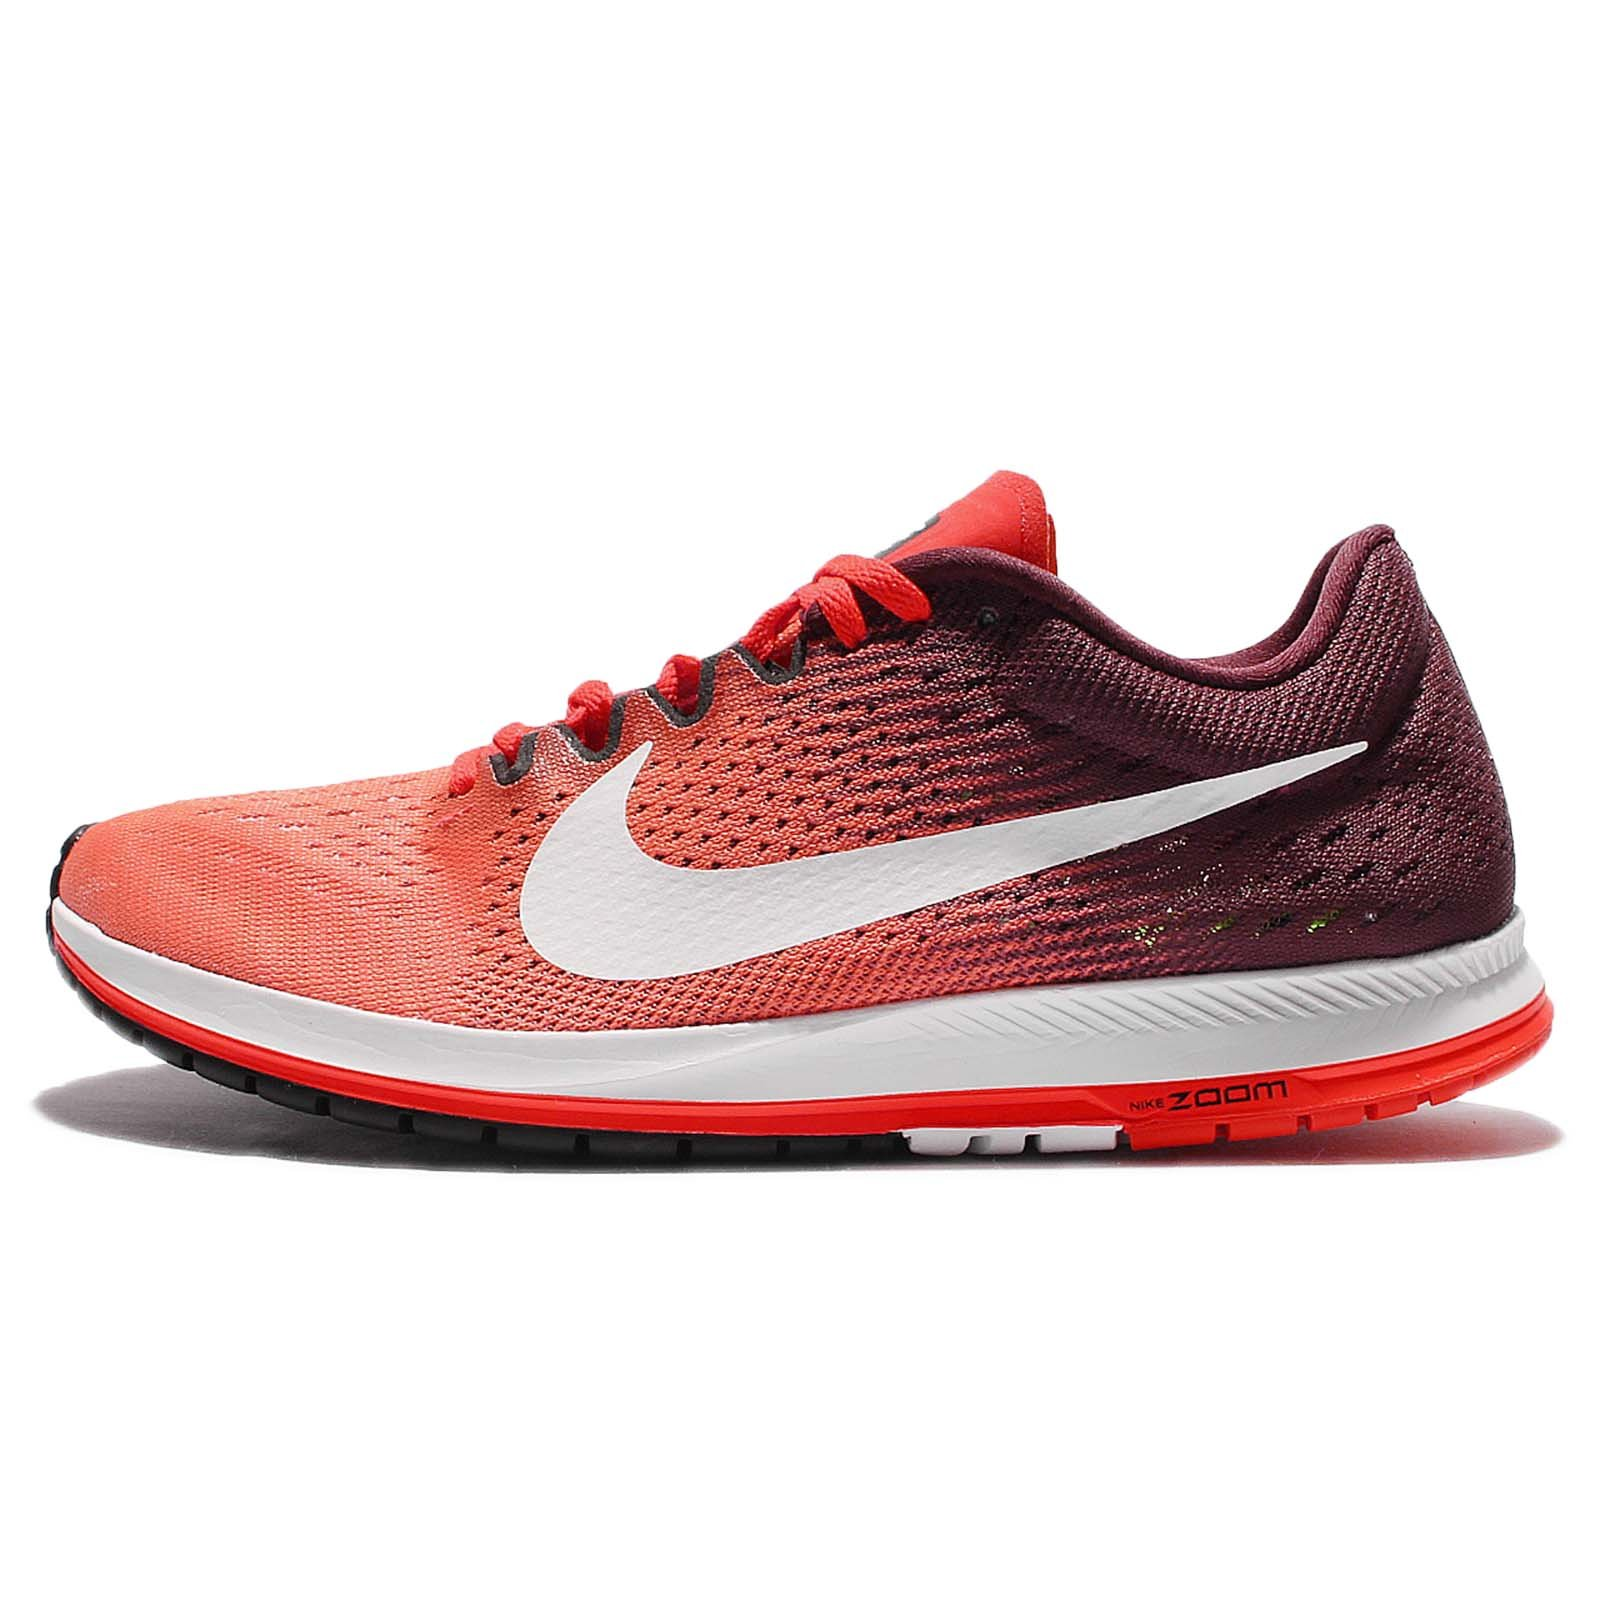 Integrar Sudamerica maleta  Mua Nike Zoom Streak 6 Unisex Running Shoe trên Amazon Mỹ chính hãng 2020    Fado